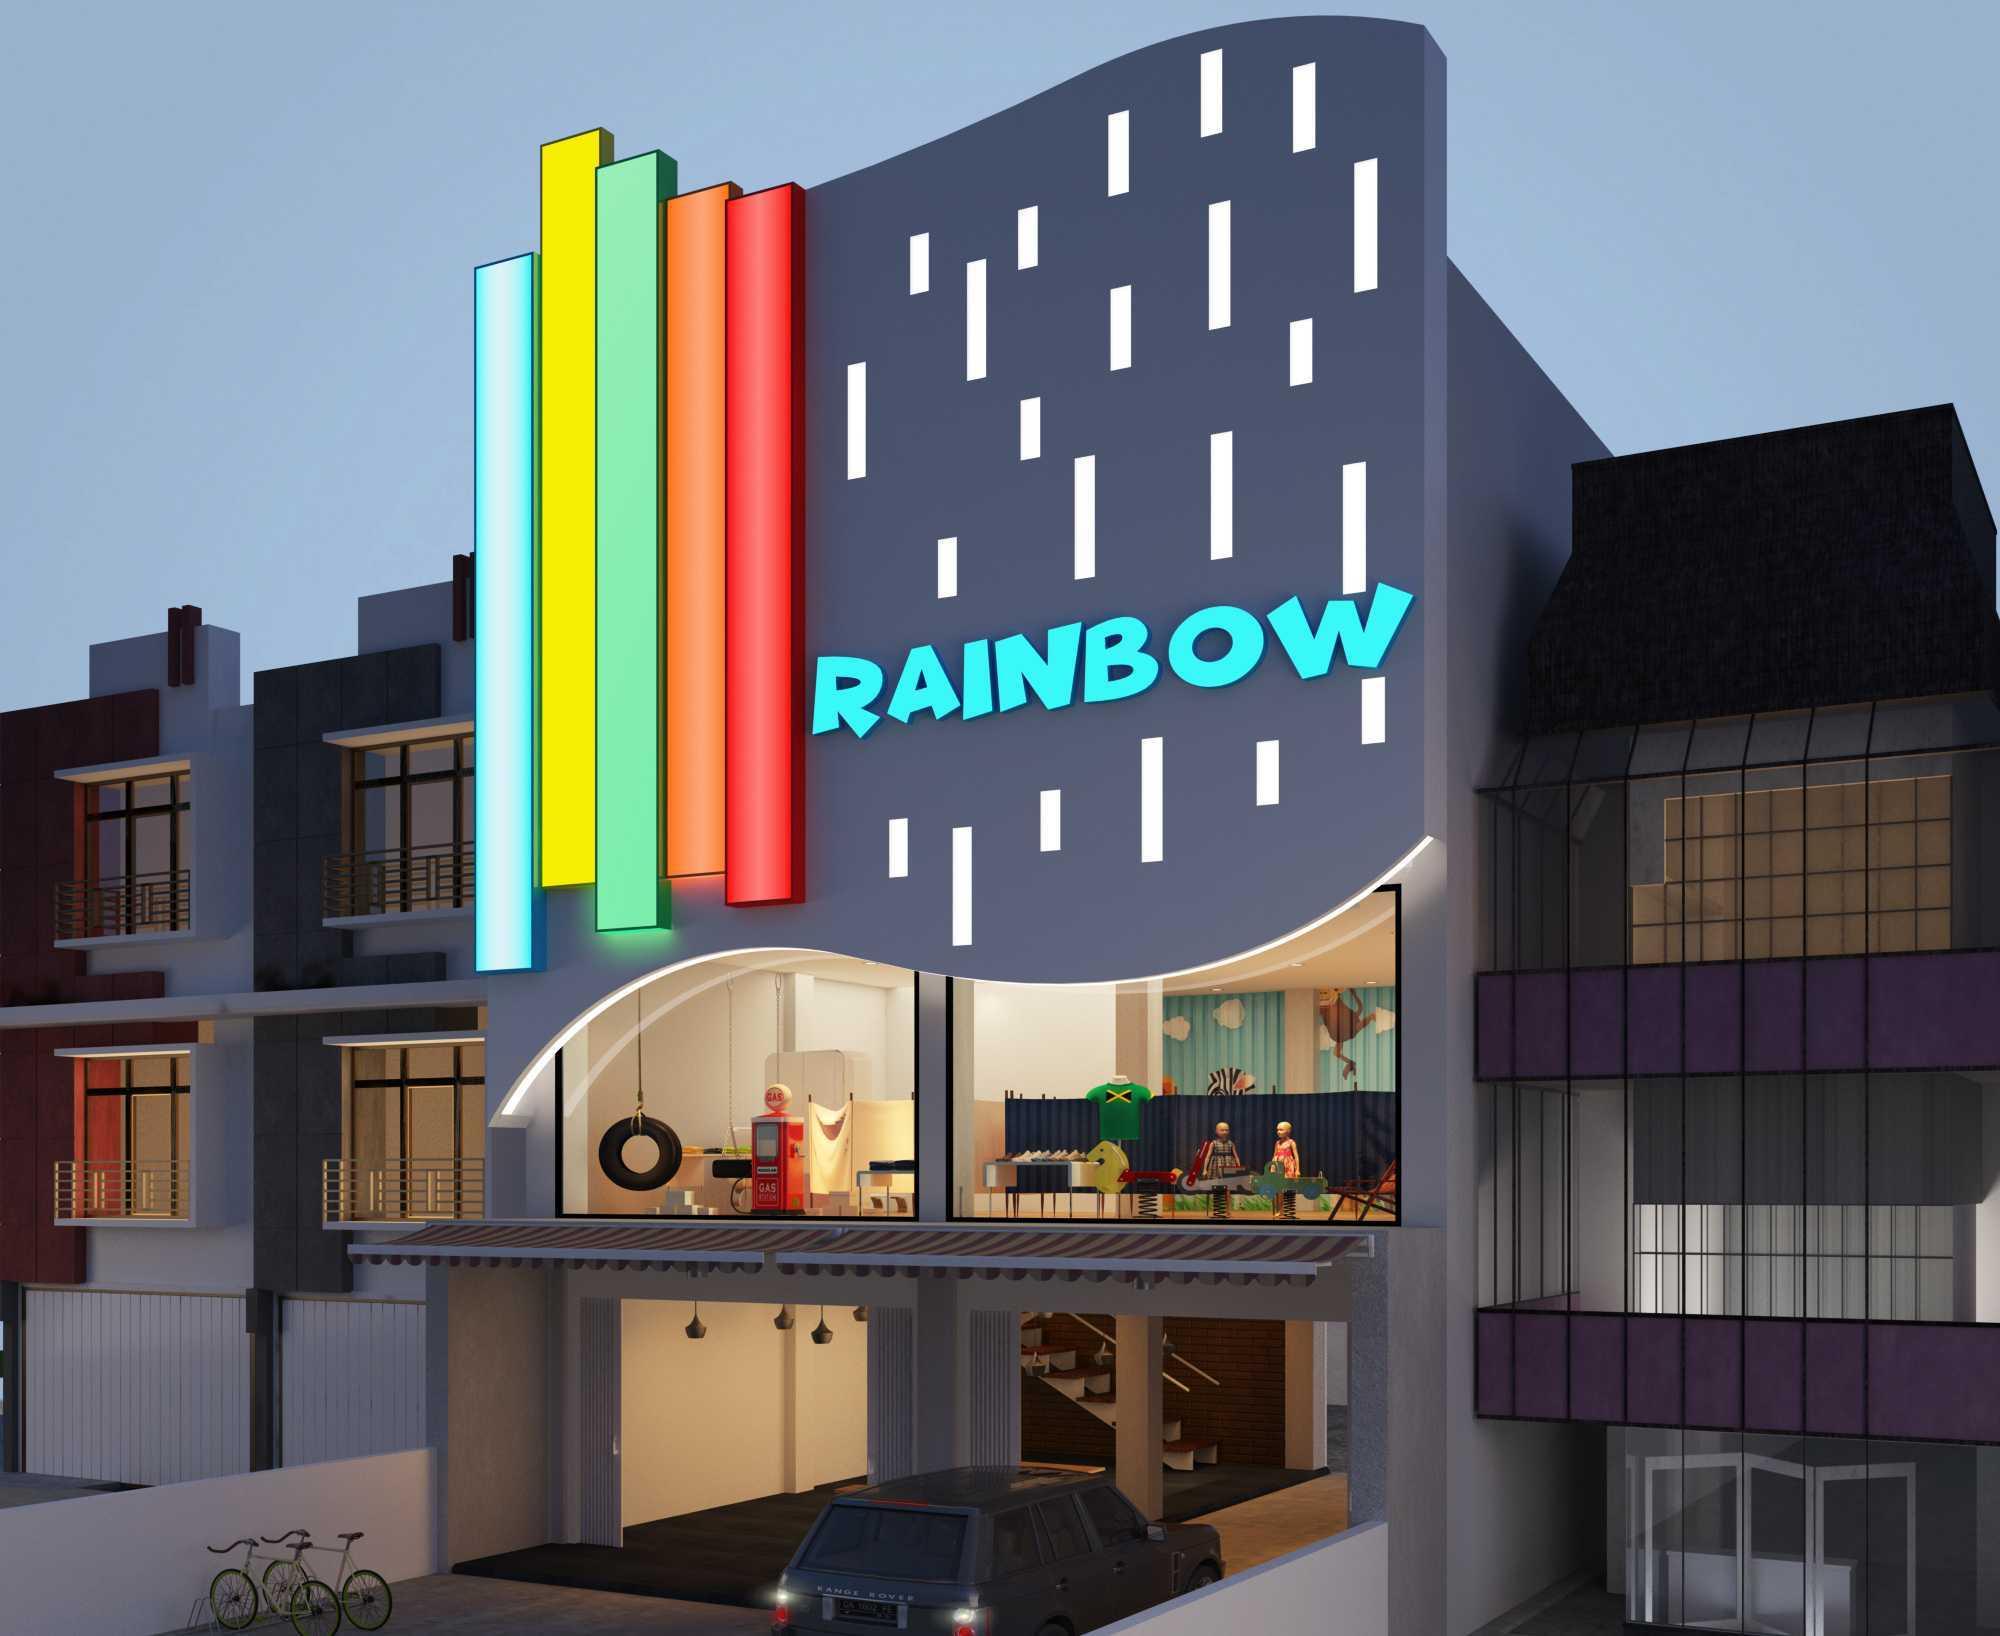 Acia Interior Baby And Kids Store Rainbow Banjarmasin, Kota Banjarmasin, Kalimantan Selatan, Indonesia Banjarmasin, Kota Banjarmasin, Kalimantan Selatan, Indonesia Acia-Interior-Baby-And-Kids-Store-Rainbow  63068